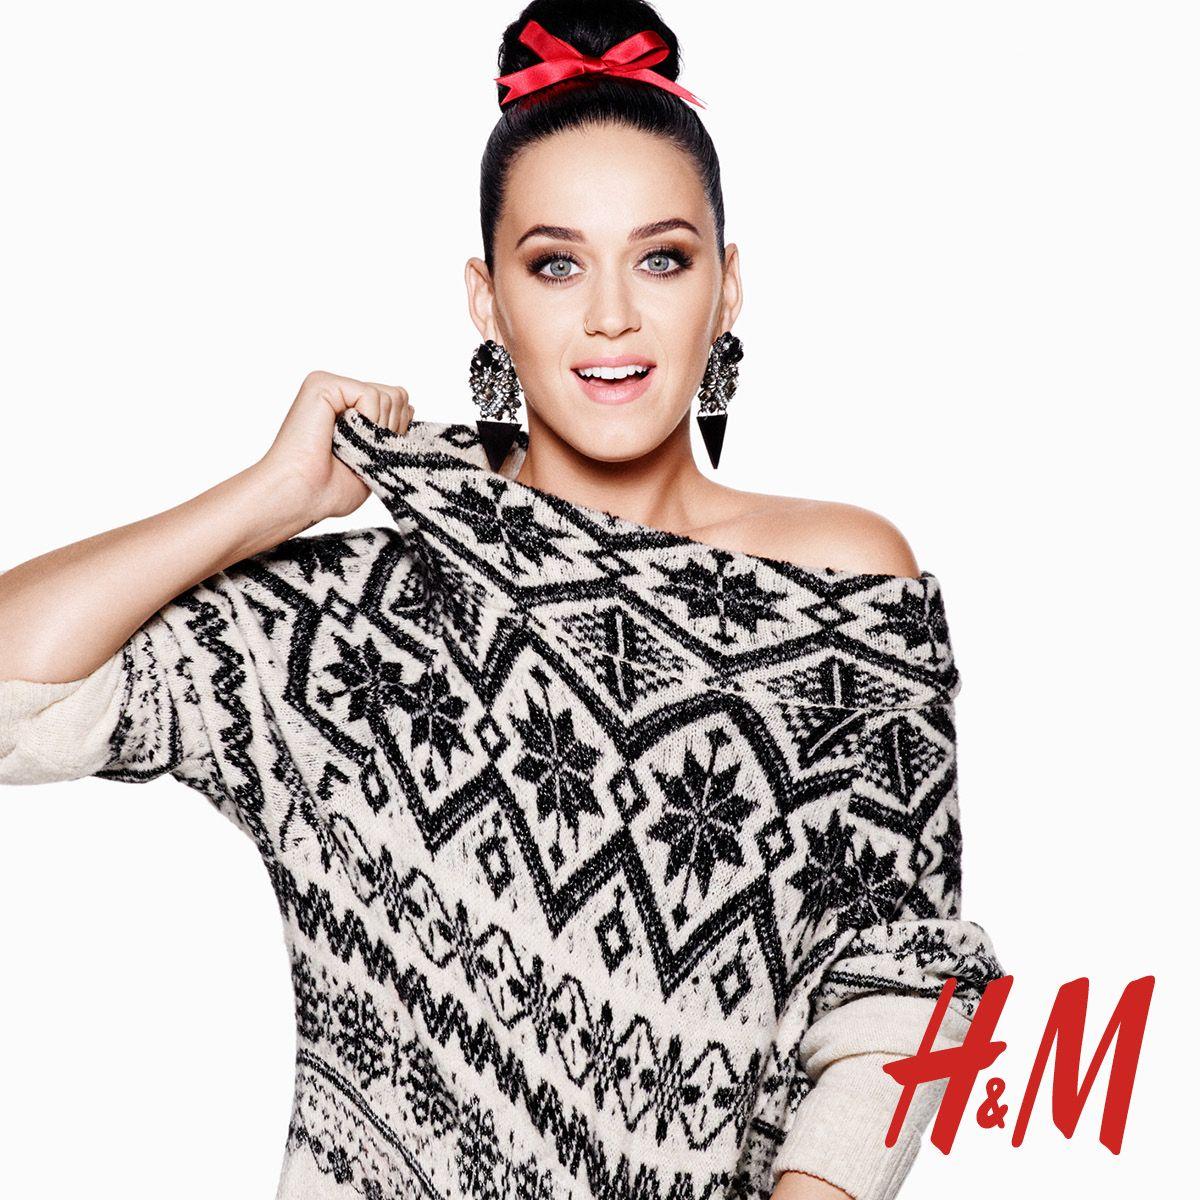 h&m katy perry - Pesquisa Google | Fashion - katy perry | Pinterest ...